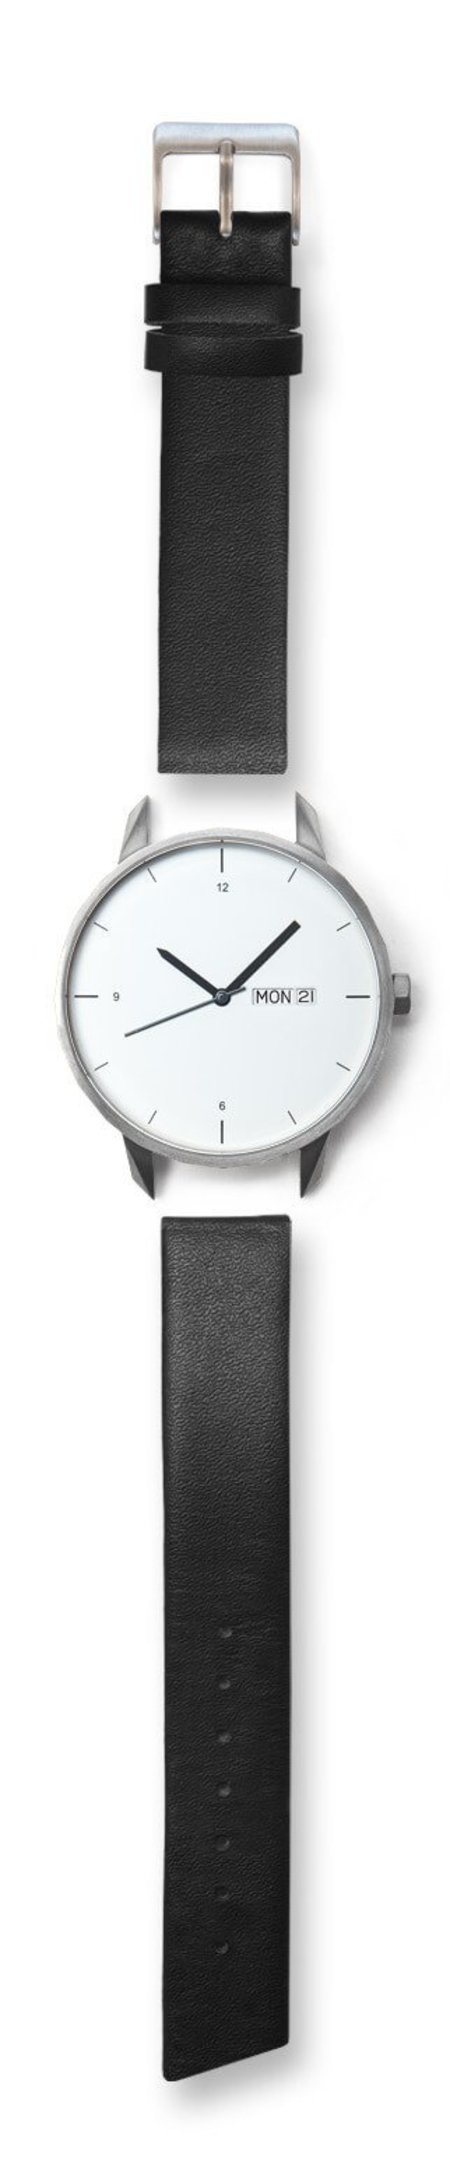 Unisex Tinker Watches 42mm Silver Watch Black Strap